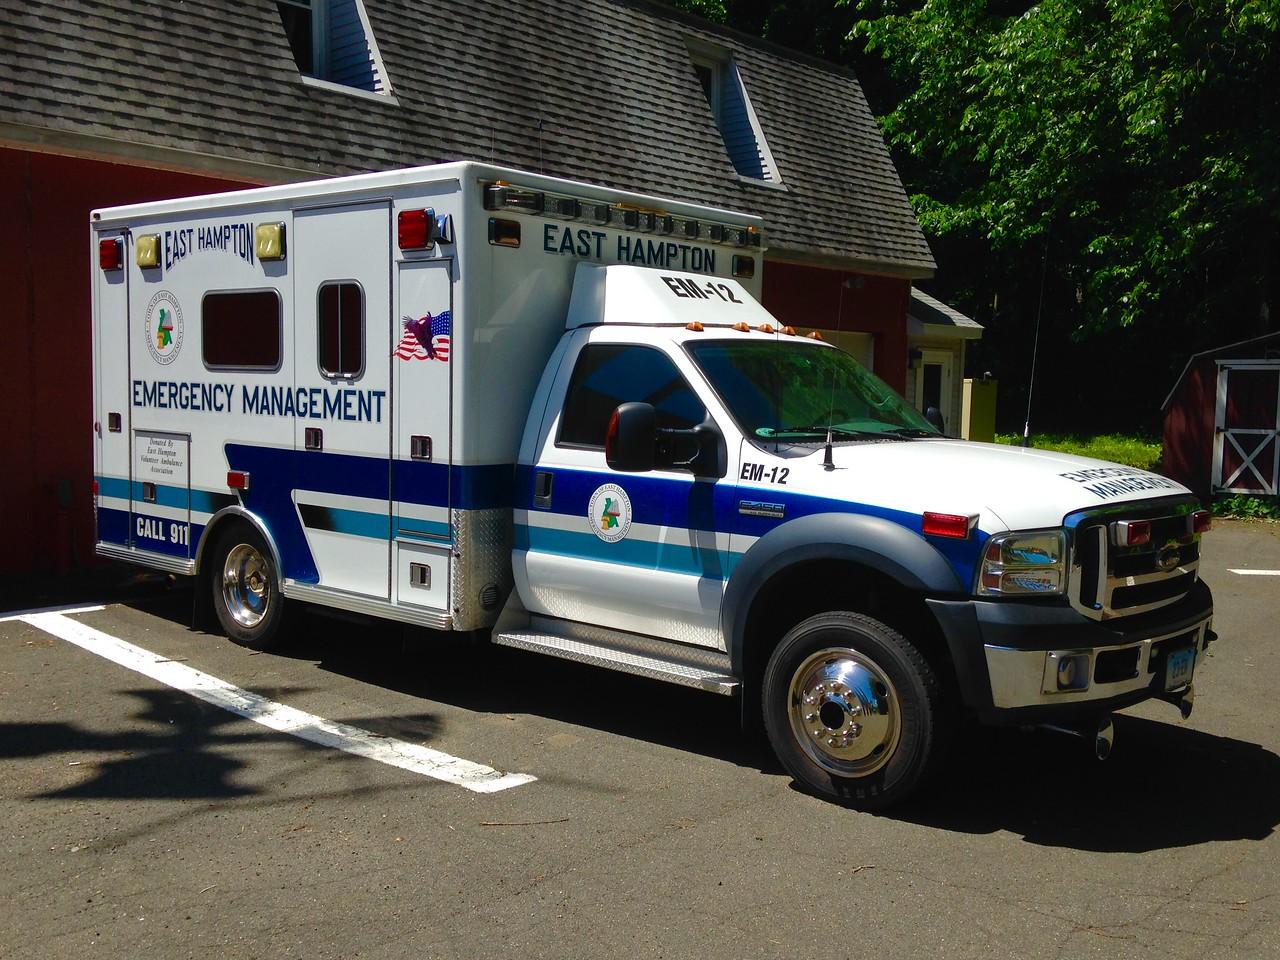 East Hampton, CT - Cobalt fire Station